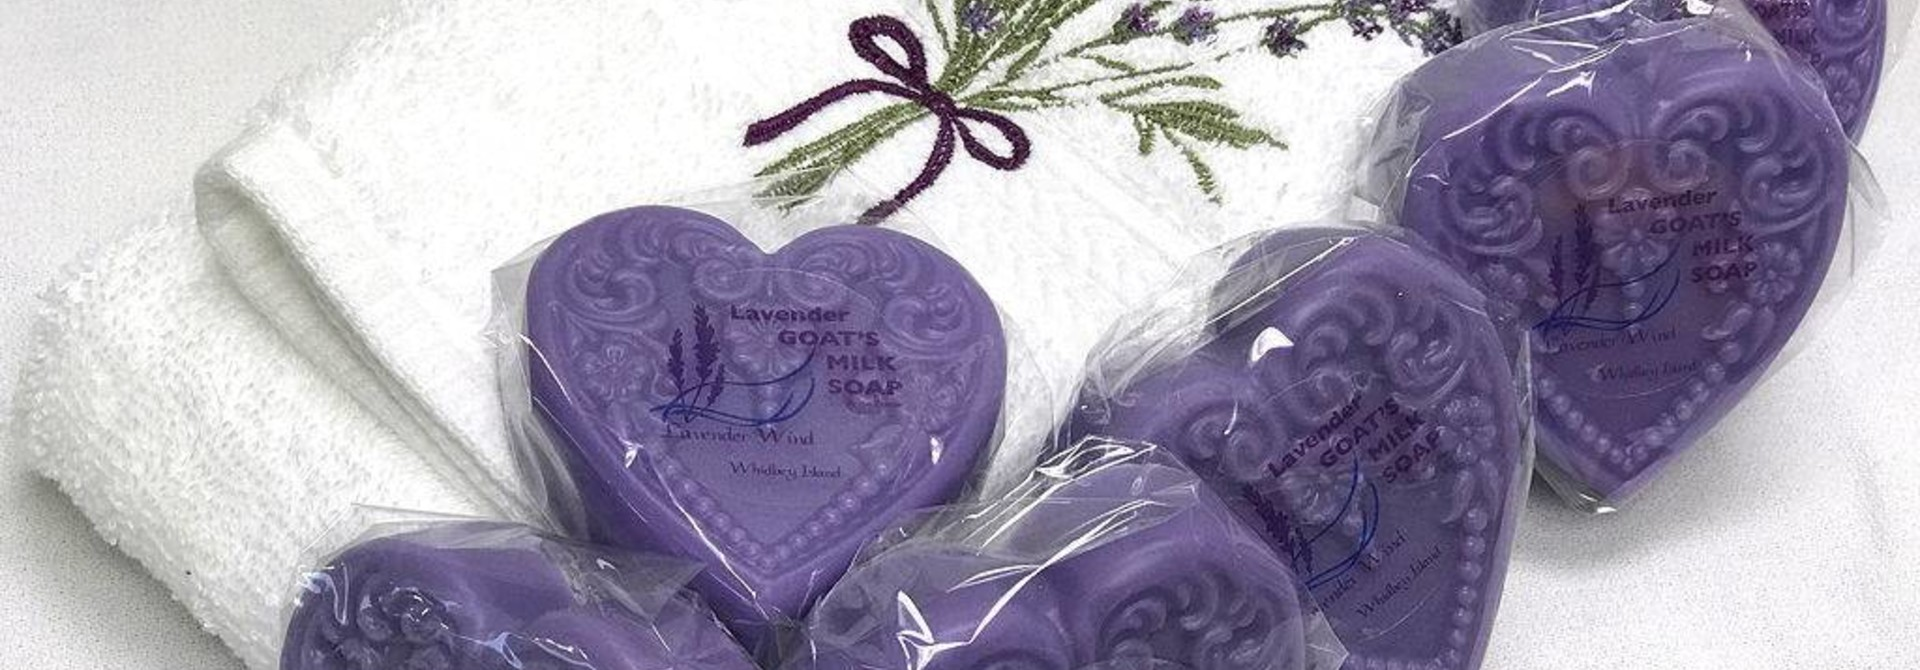 Goat's Milk Soap Small Heart Lavender